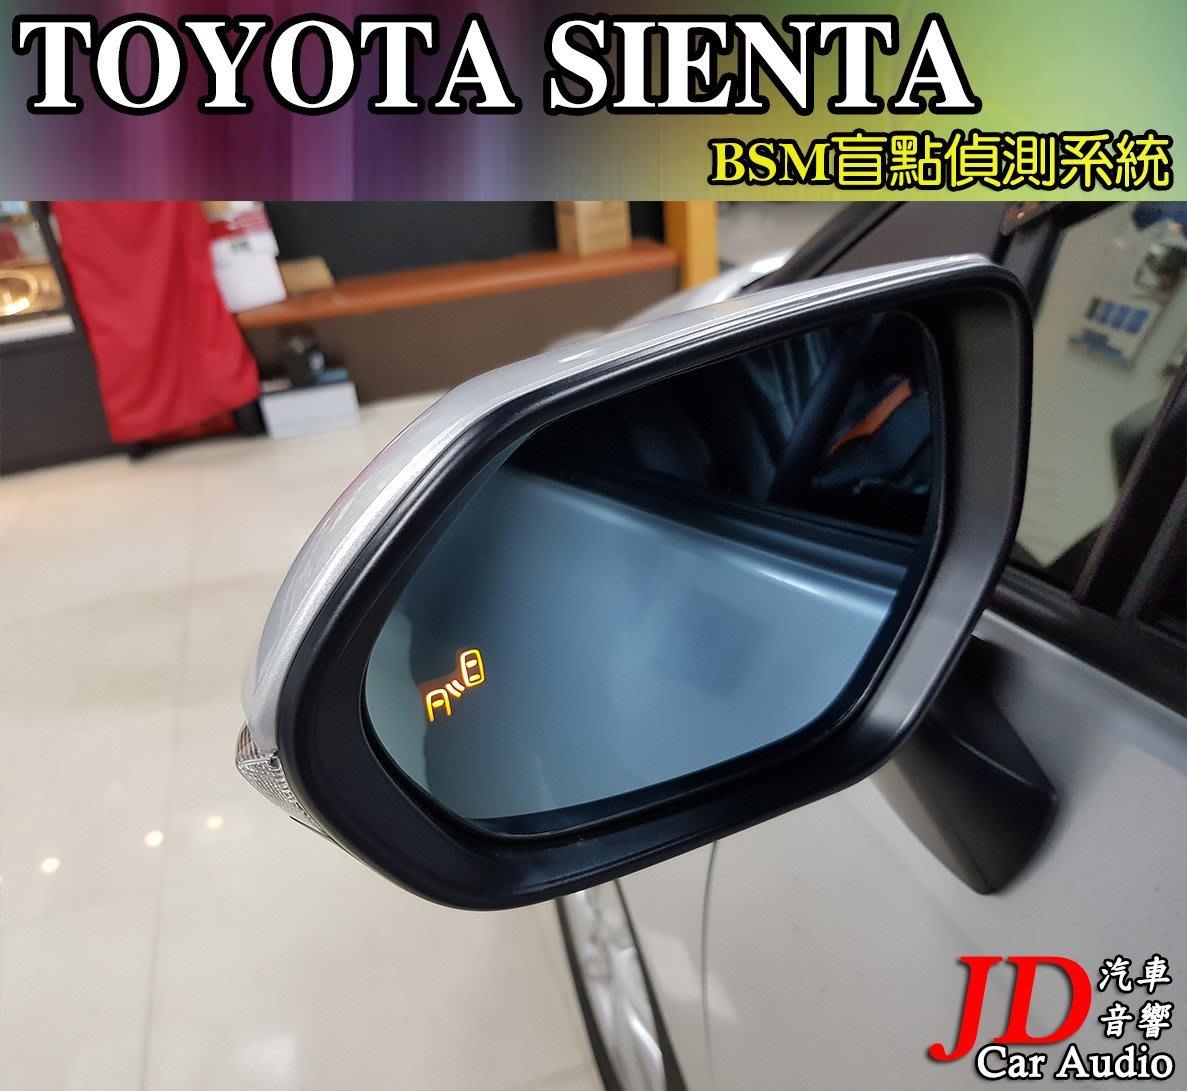 【JD汽車音響】實裝車 TOYOTA SIENTA BSM盲點偵測系統 盲區偵測系統 車側警示 NCC國家認證 免鑽洞。